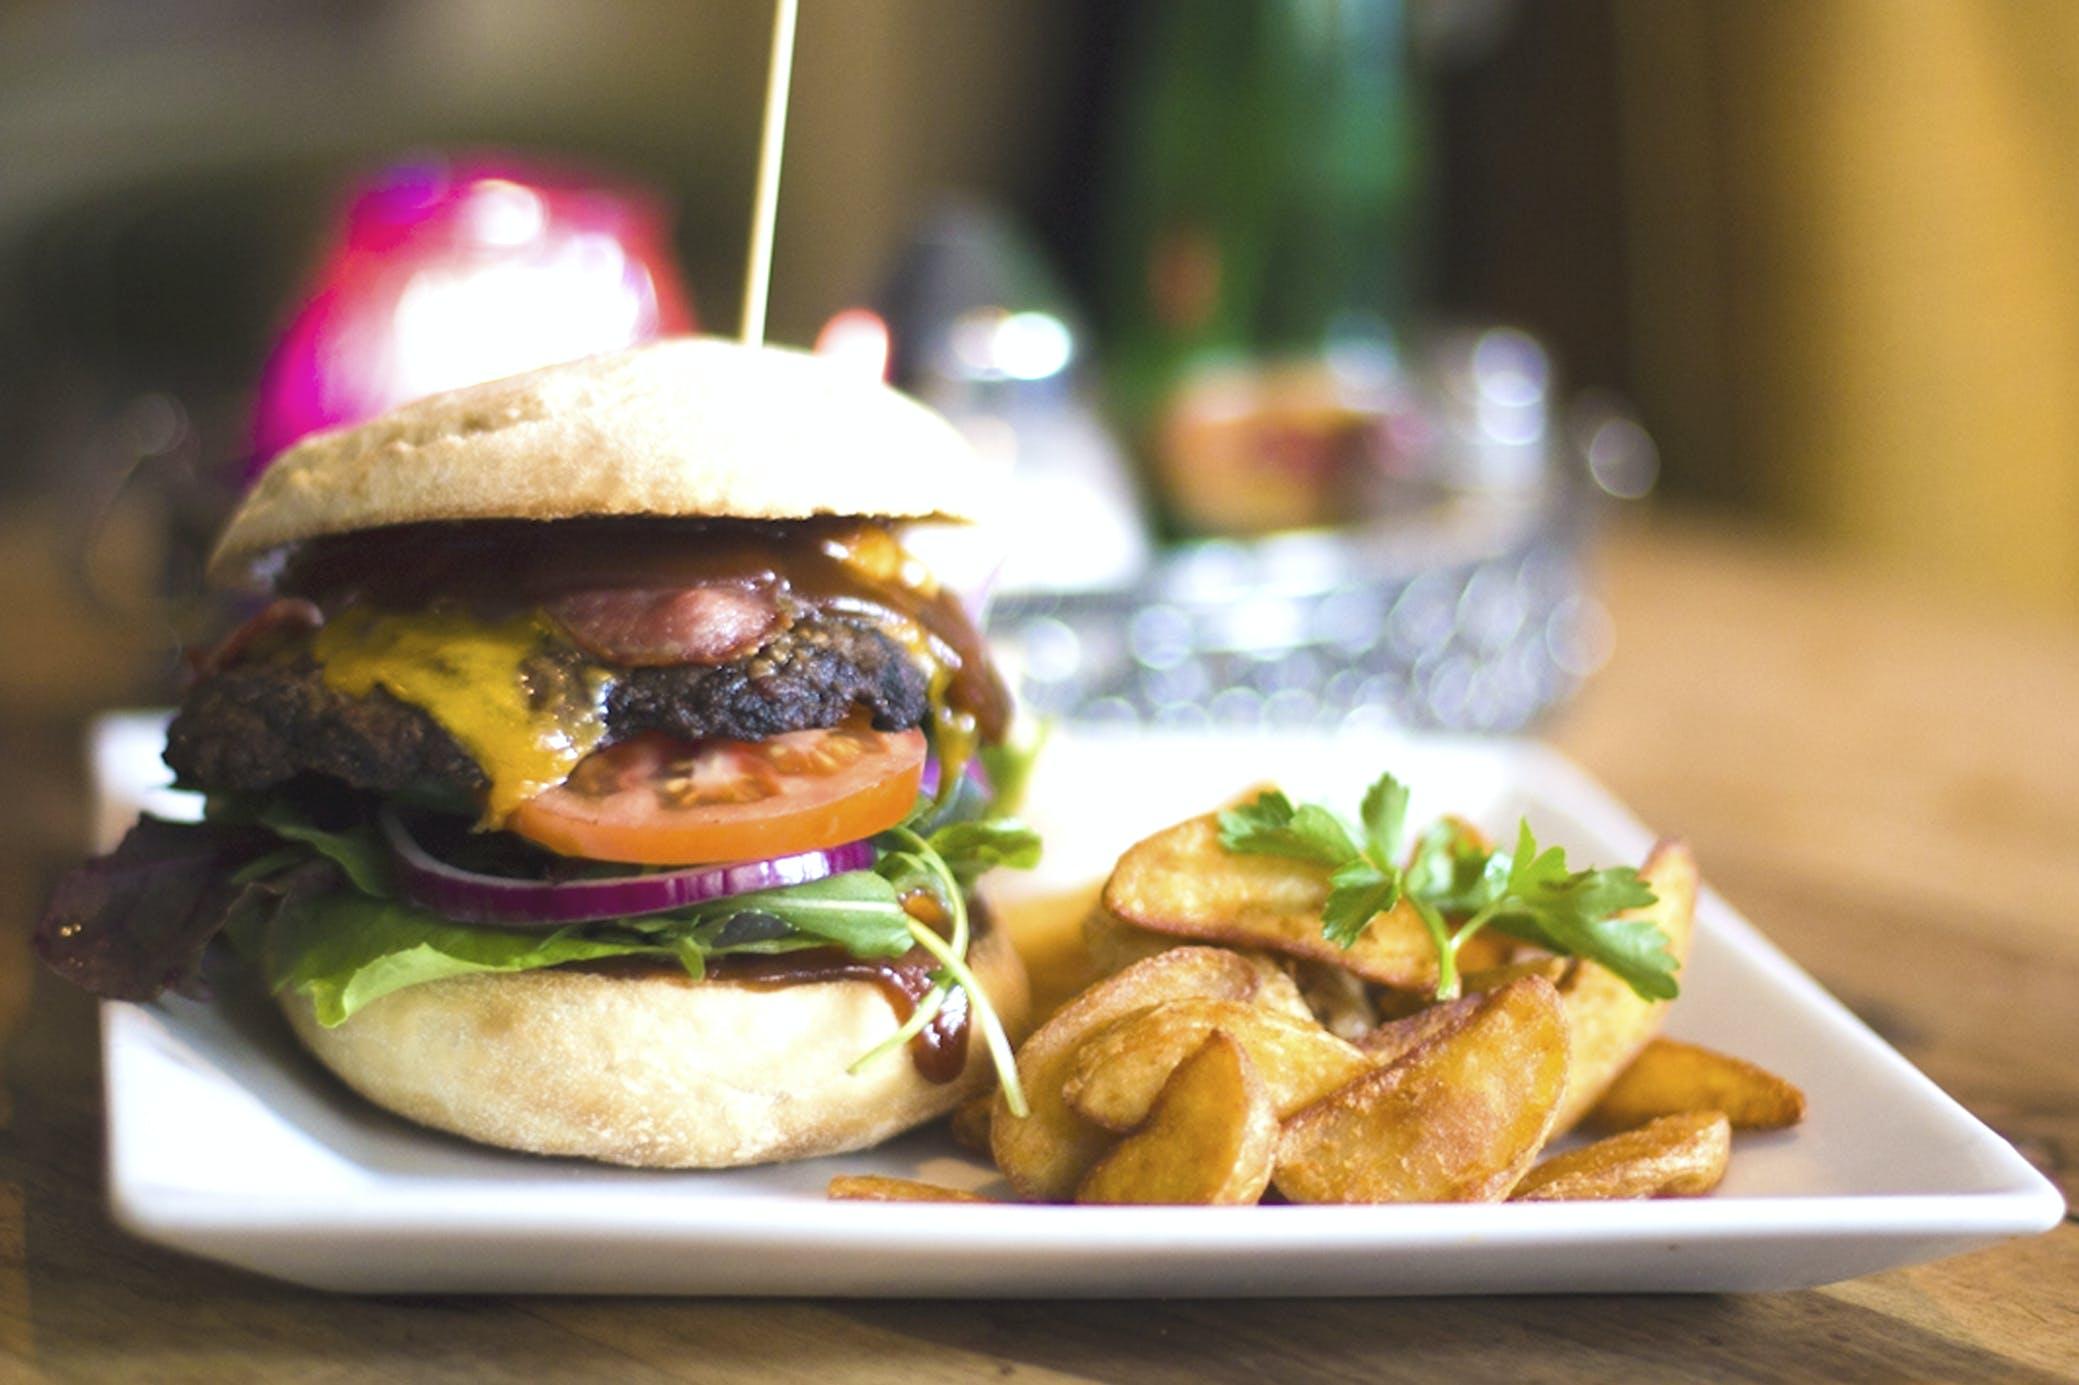 Kostenloses Stock Foto zu brot, brötchen, burger, cheeseburger